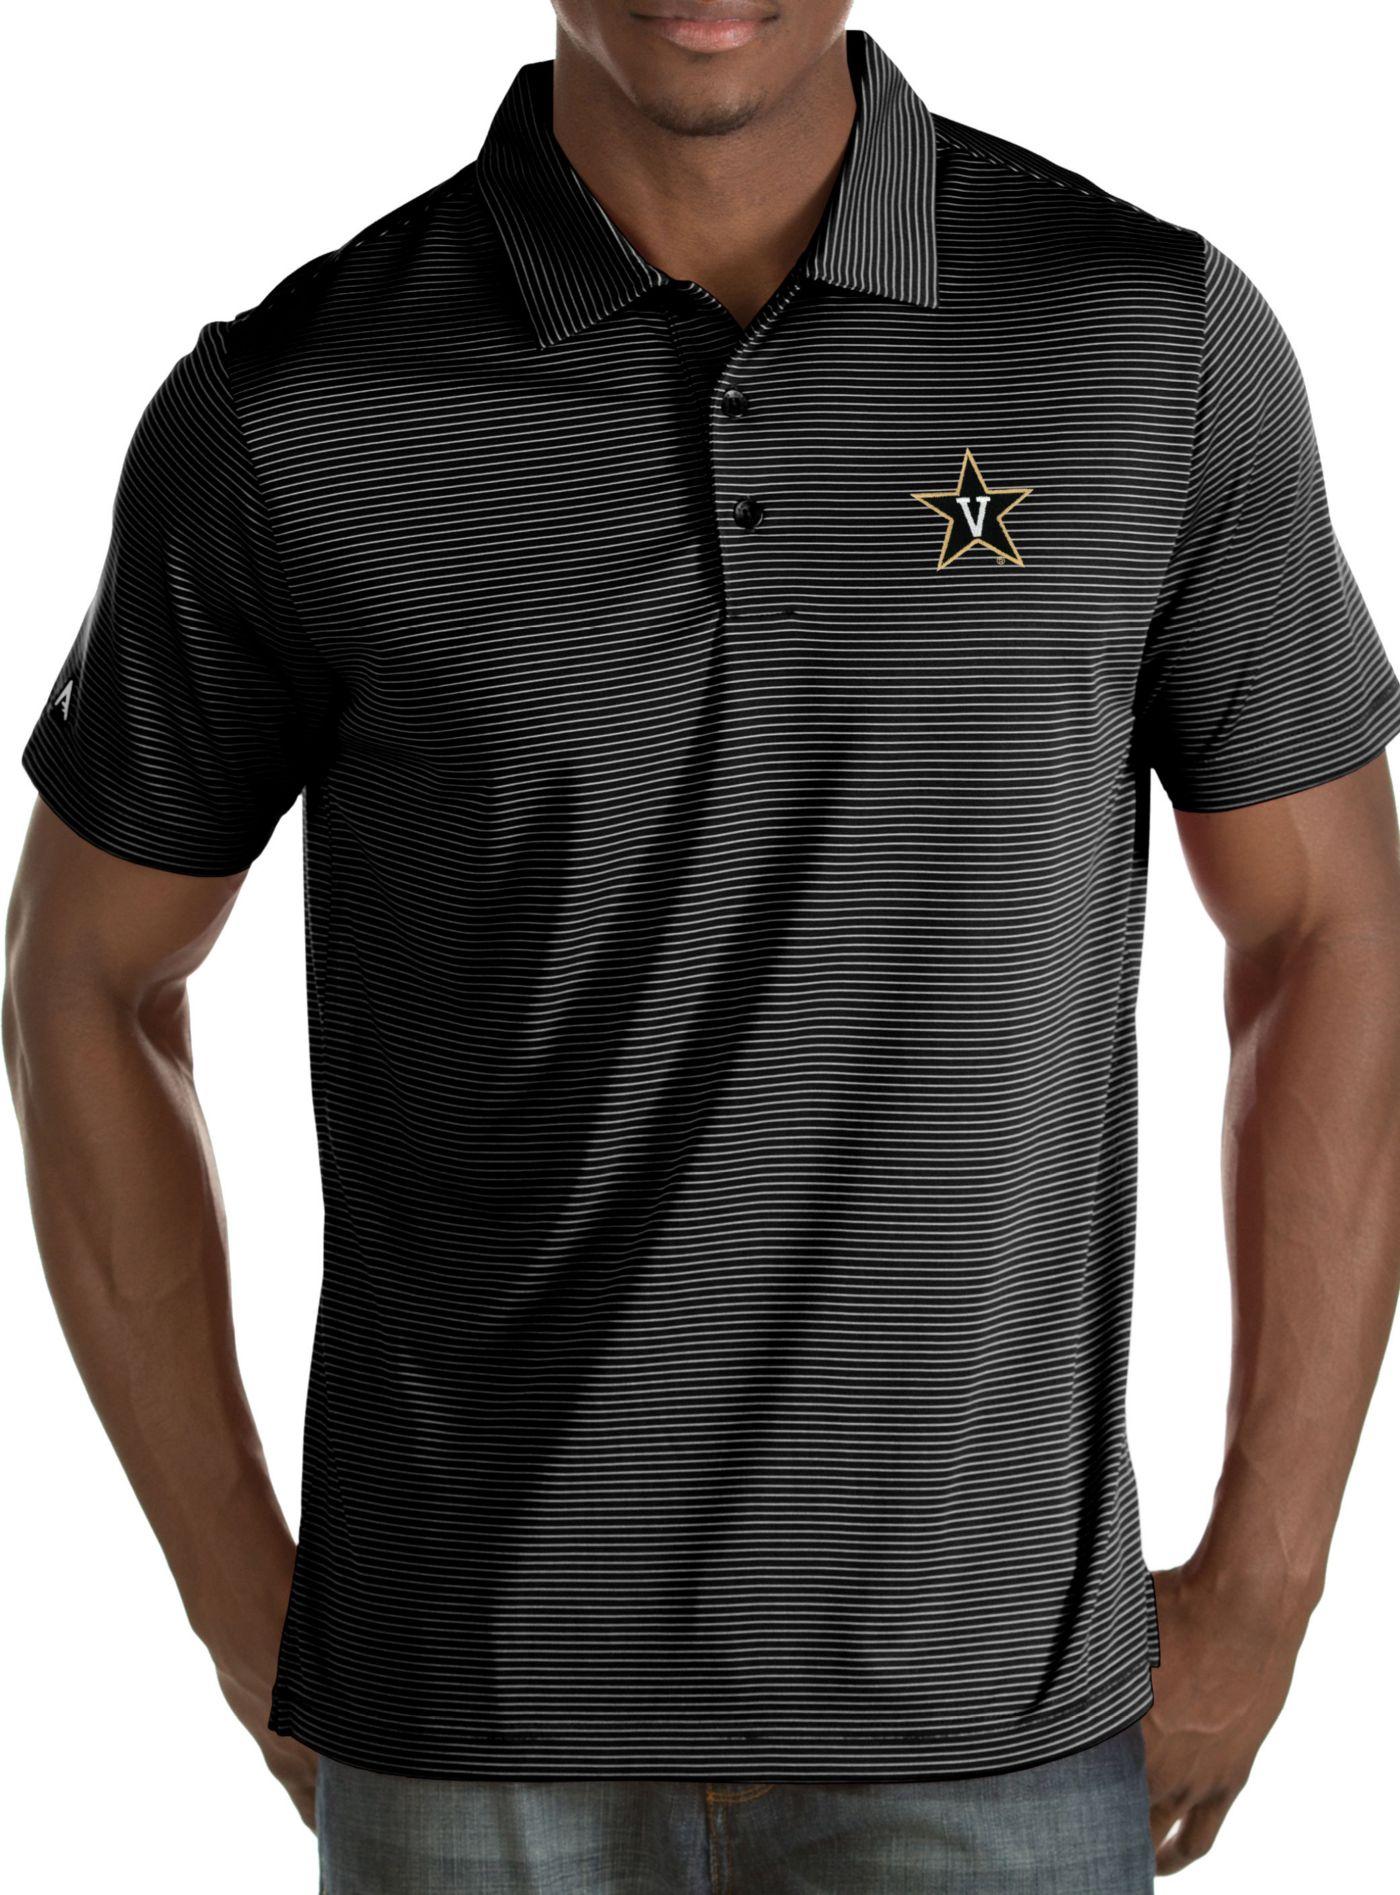 Antigua Men's Vanderbilt Commodores Black/White Quest Polo